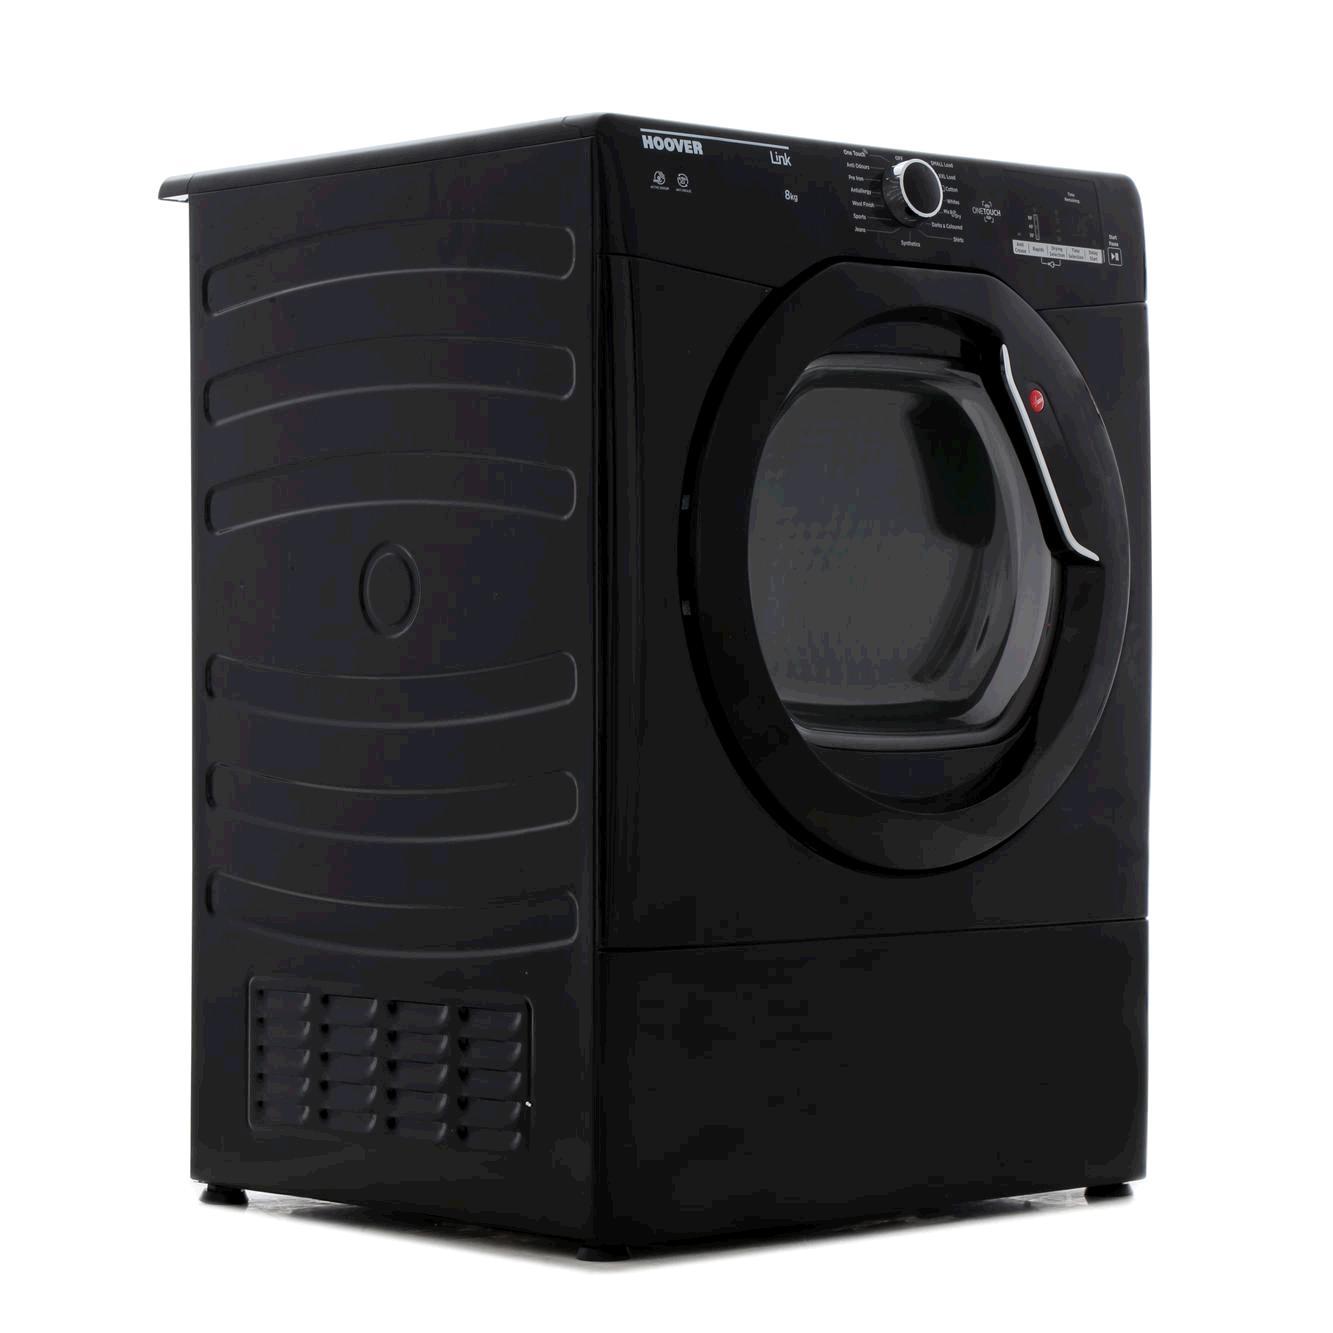 Hoover Vented Tumble Dryer 8kg in Black